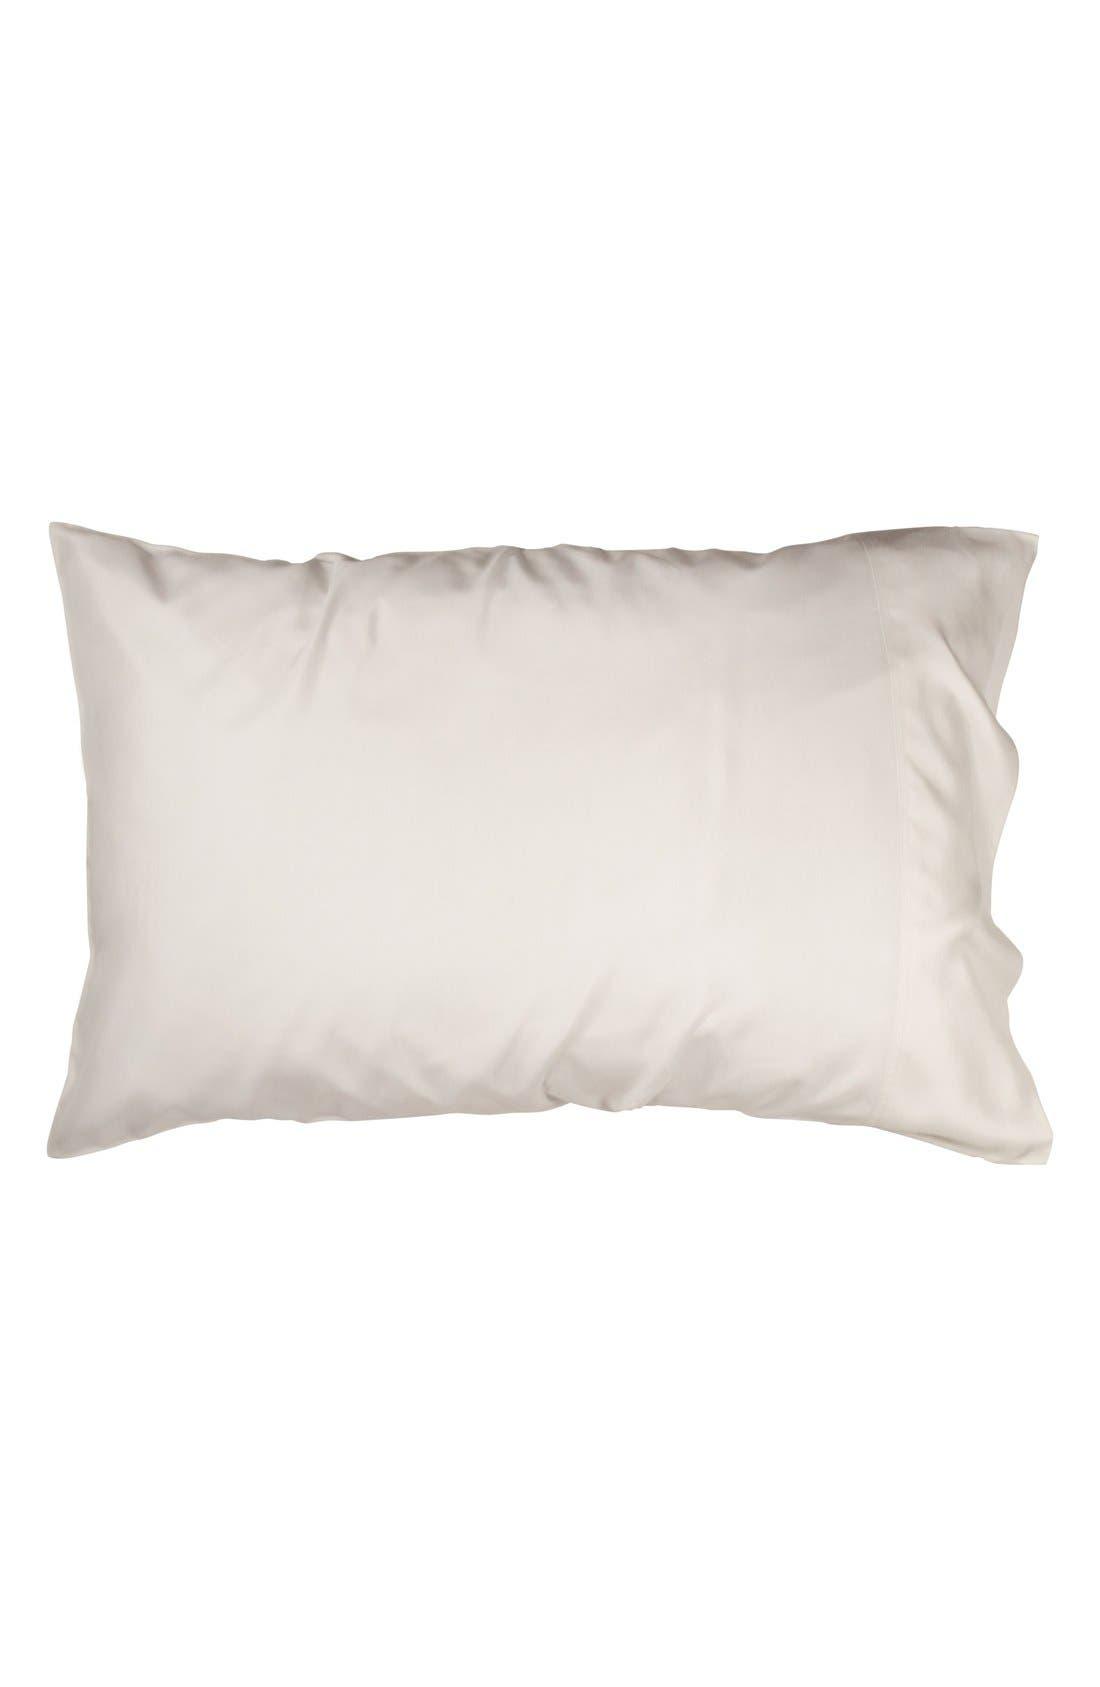 Donna Karan Collection 'Silk Essentials' Habutai Silk Pillowcase,                             Alternate thumbnail 2, color,                             Platinum